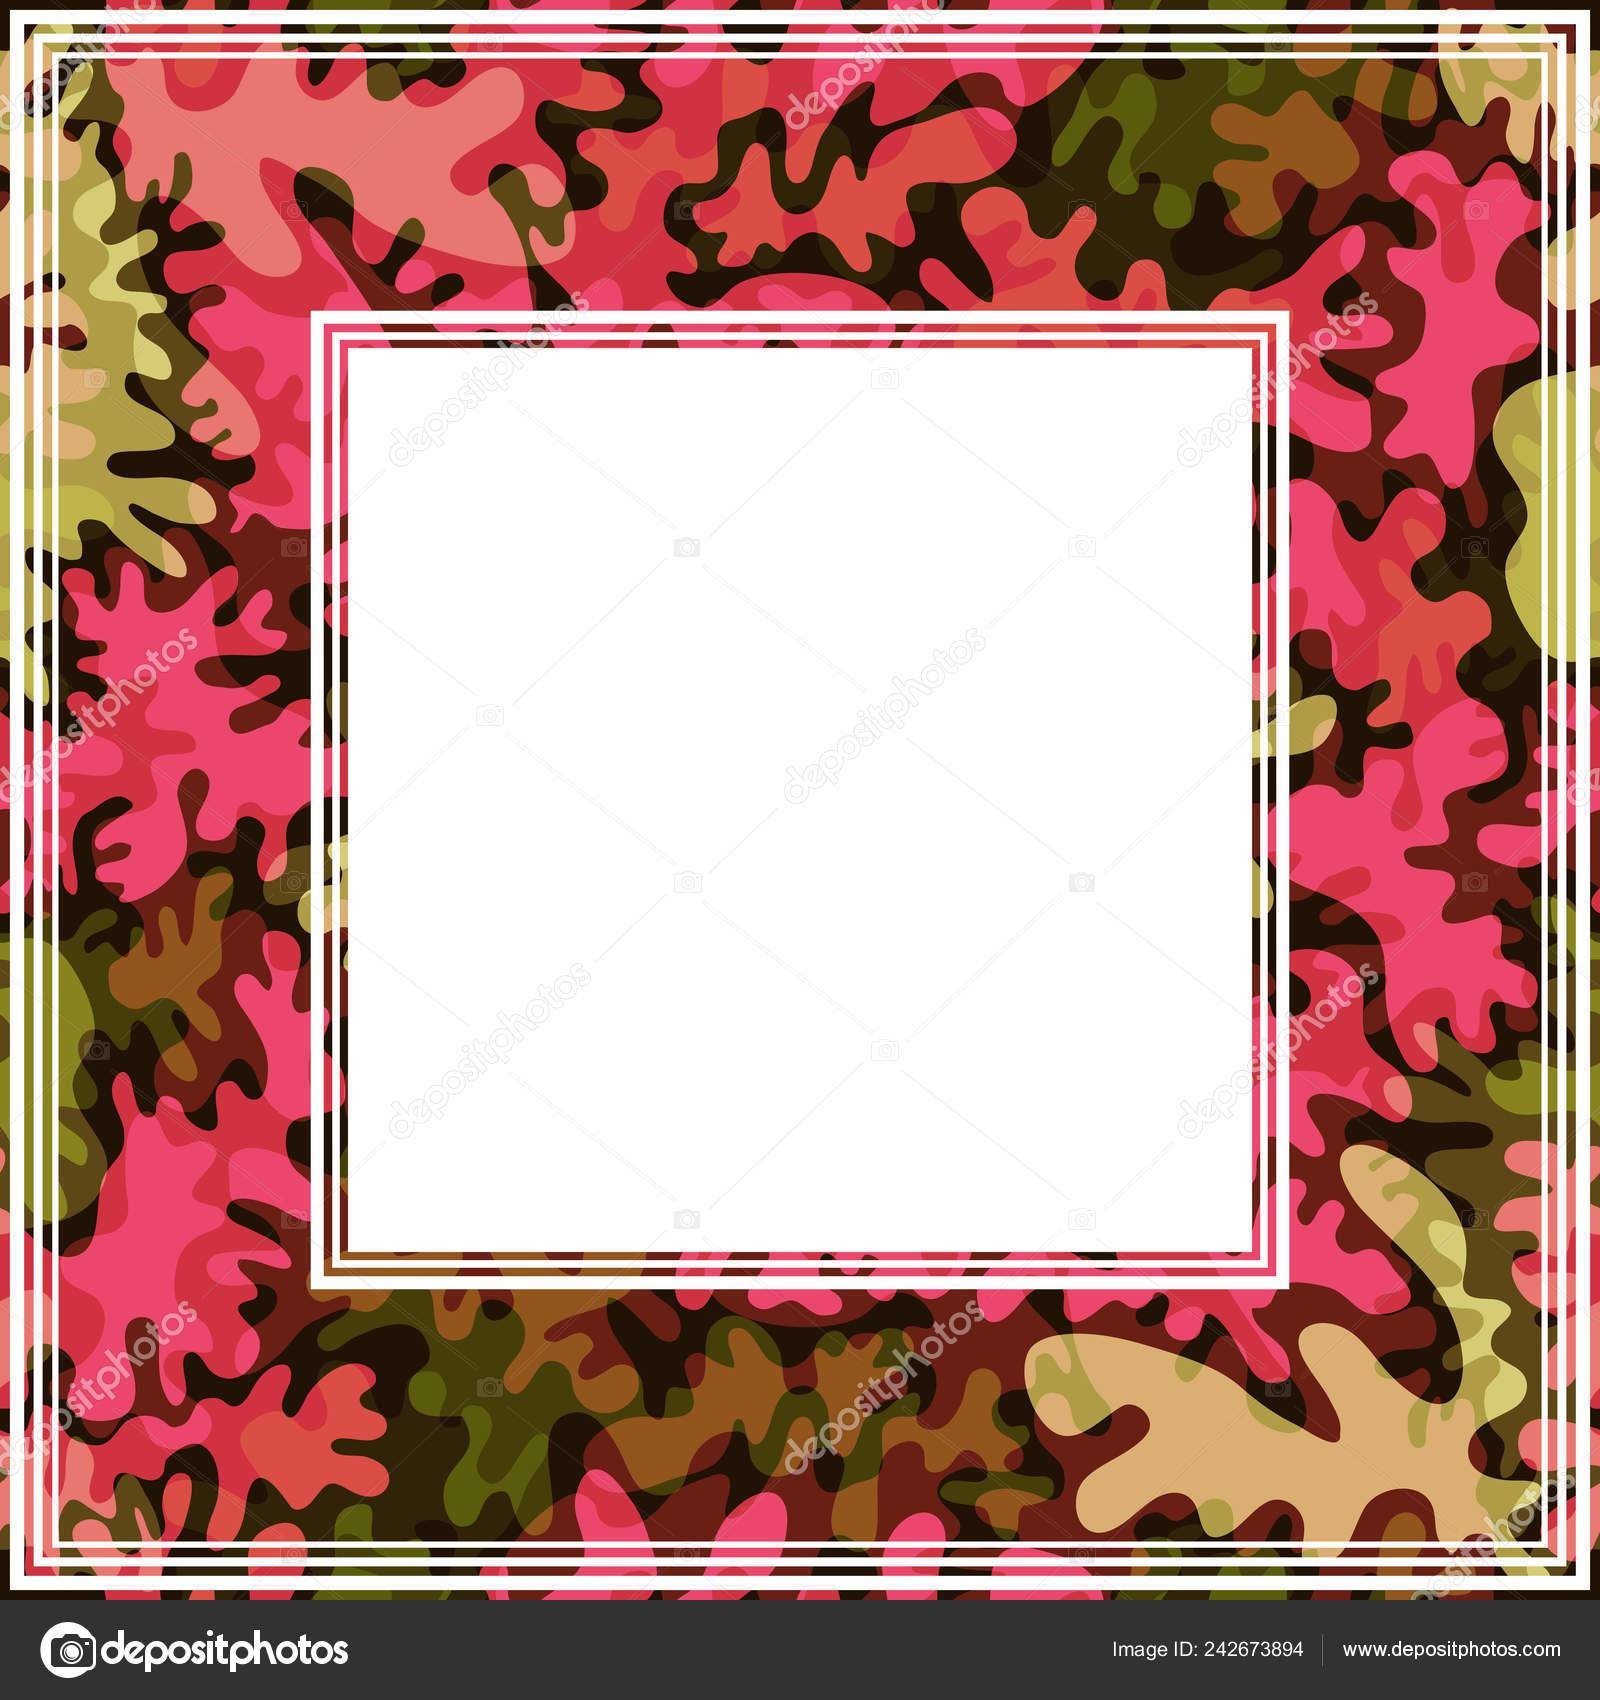 Border Trendy Fashion Camouflage Pattern Design Element Photo Frames